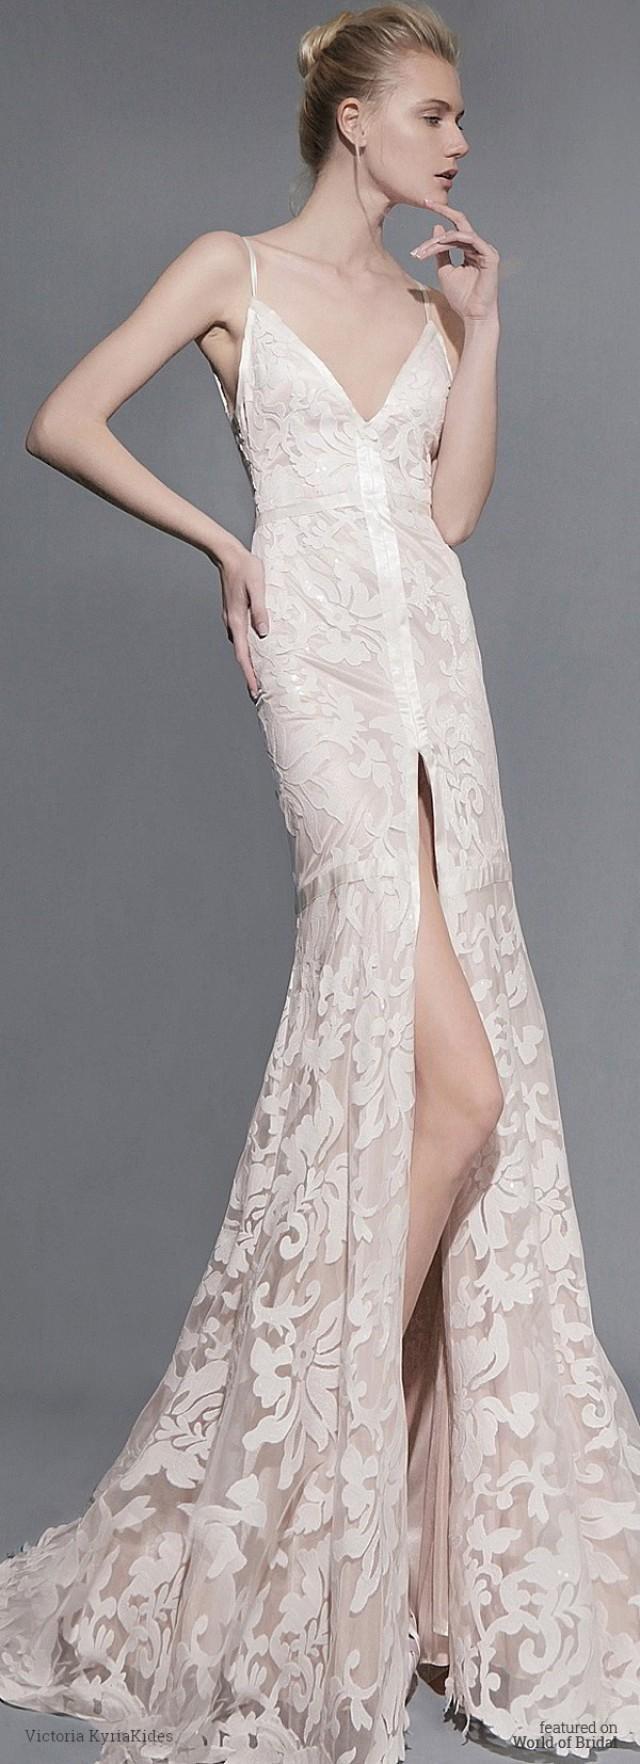 9c802c70a4c Victoria KyriaKides Spring 2016 Wedding Dresses  2540516 - Weddbook